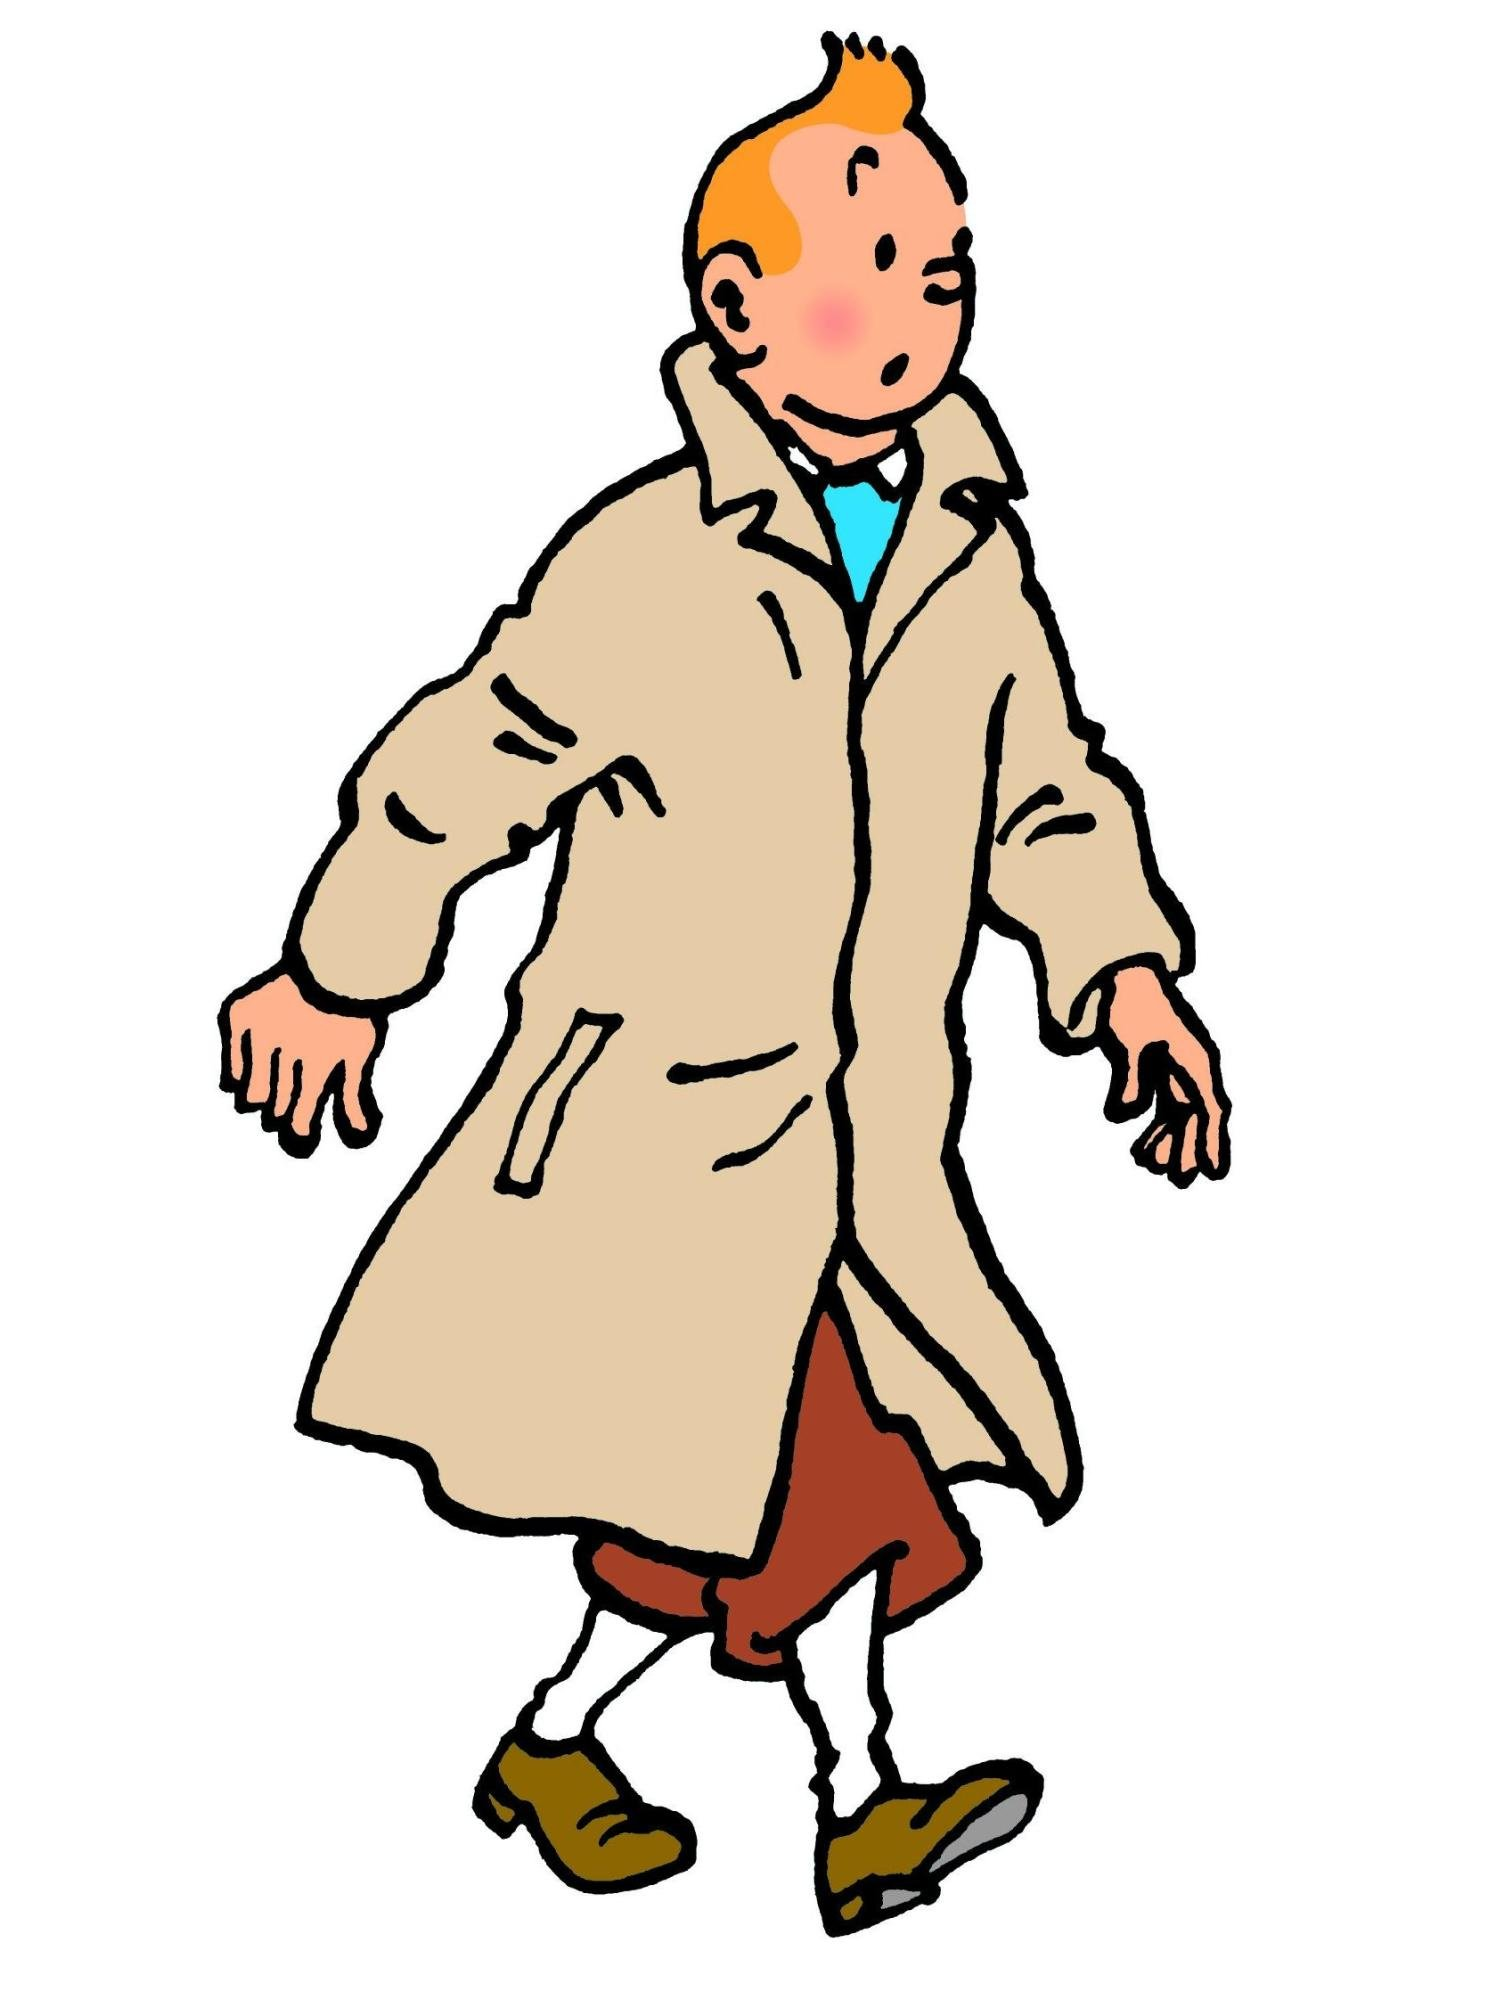 http://img3.wikia.nocookie.net/__cb20111118095003/tintin/images/6/62/Tintin-roi-de-belgique-en-mai-01.jpg